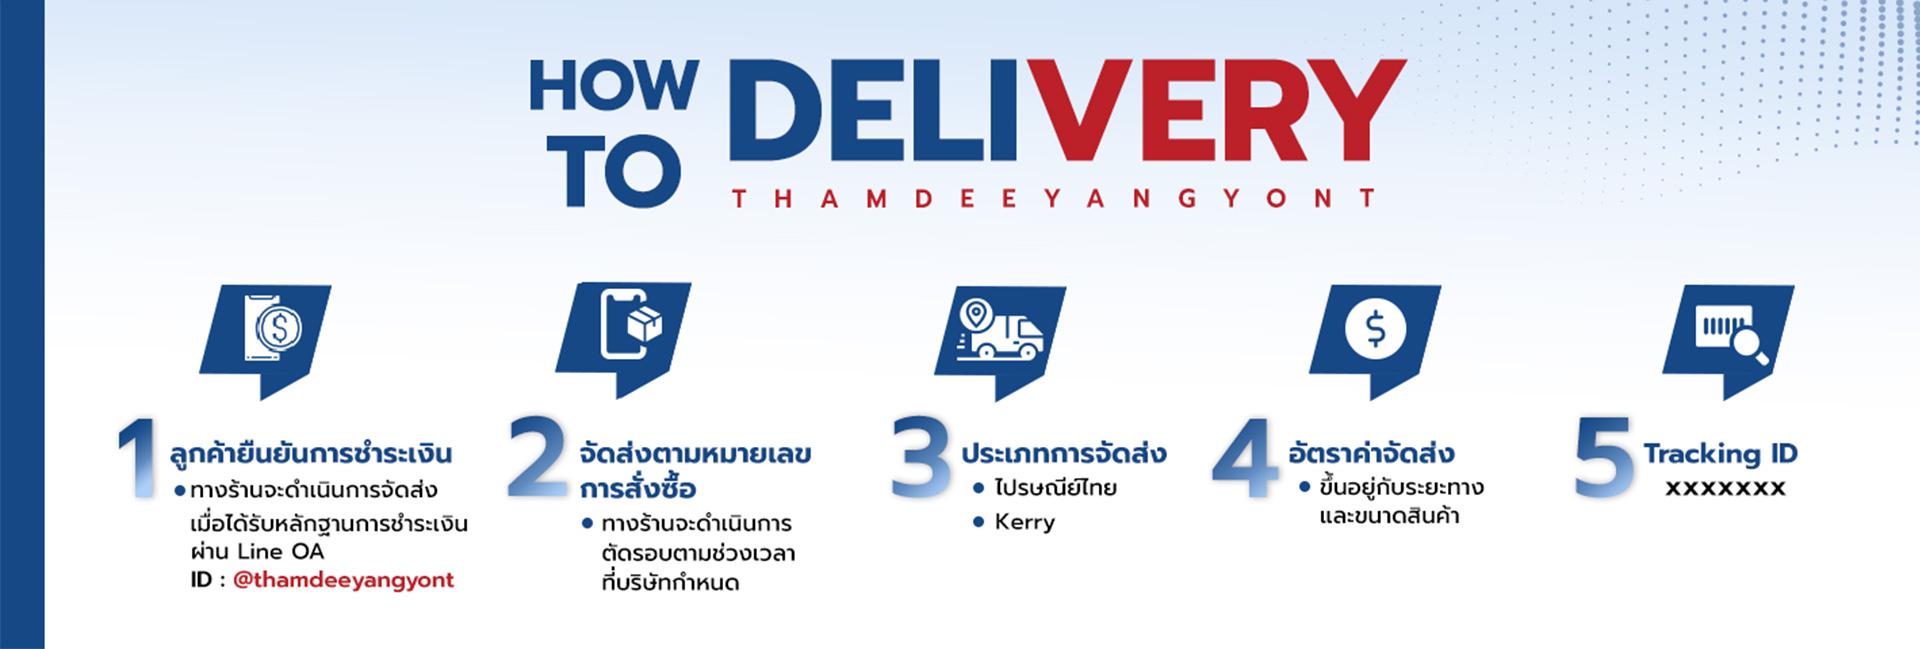 delivery_ทำดียางยนต์